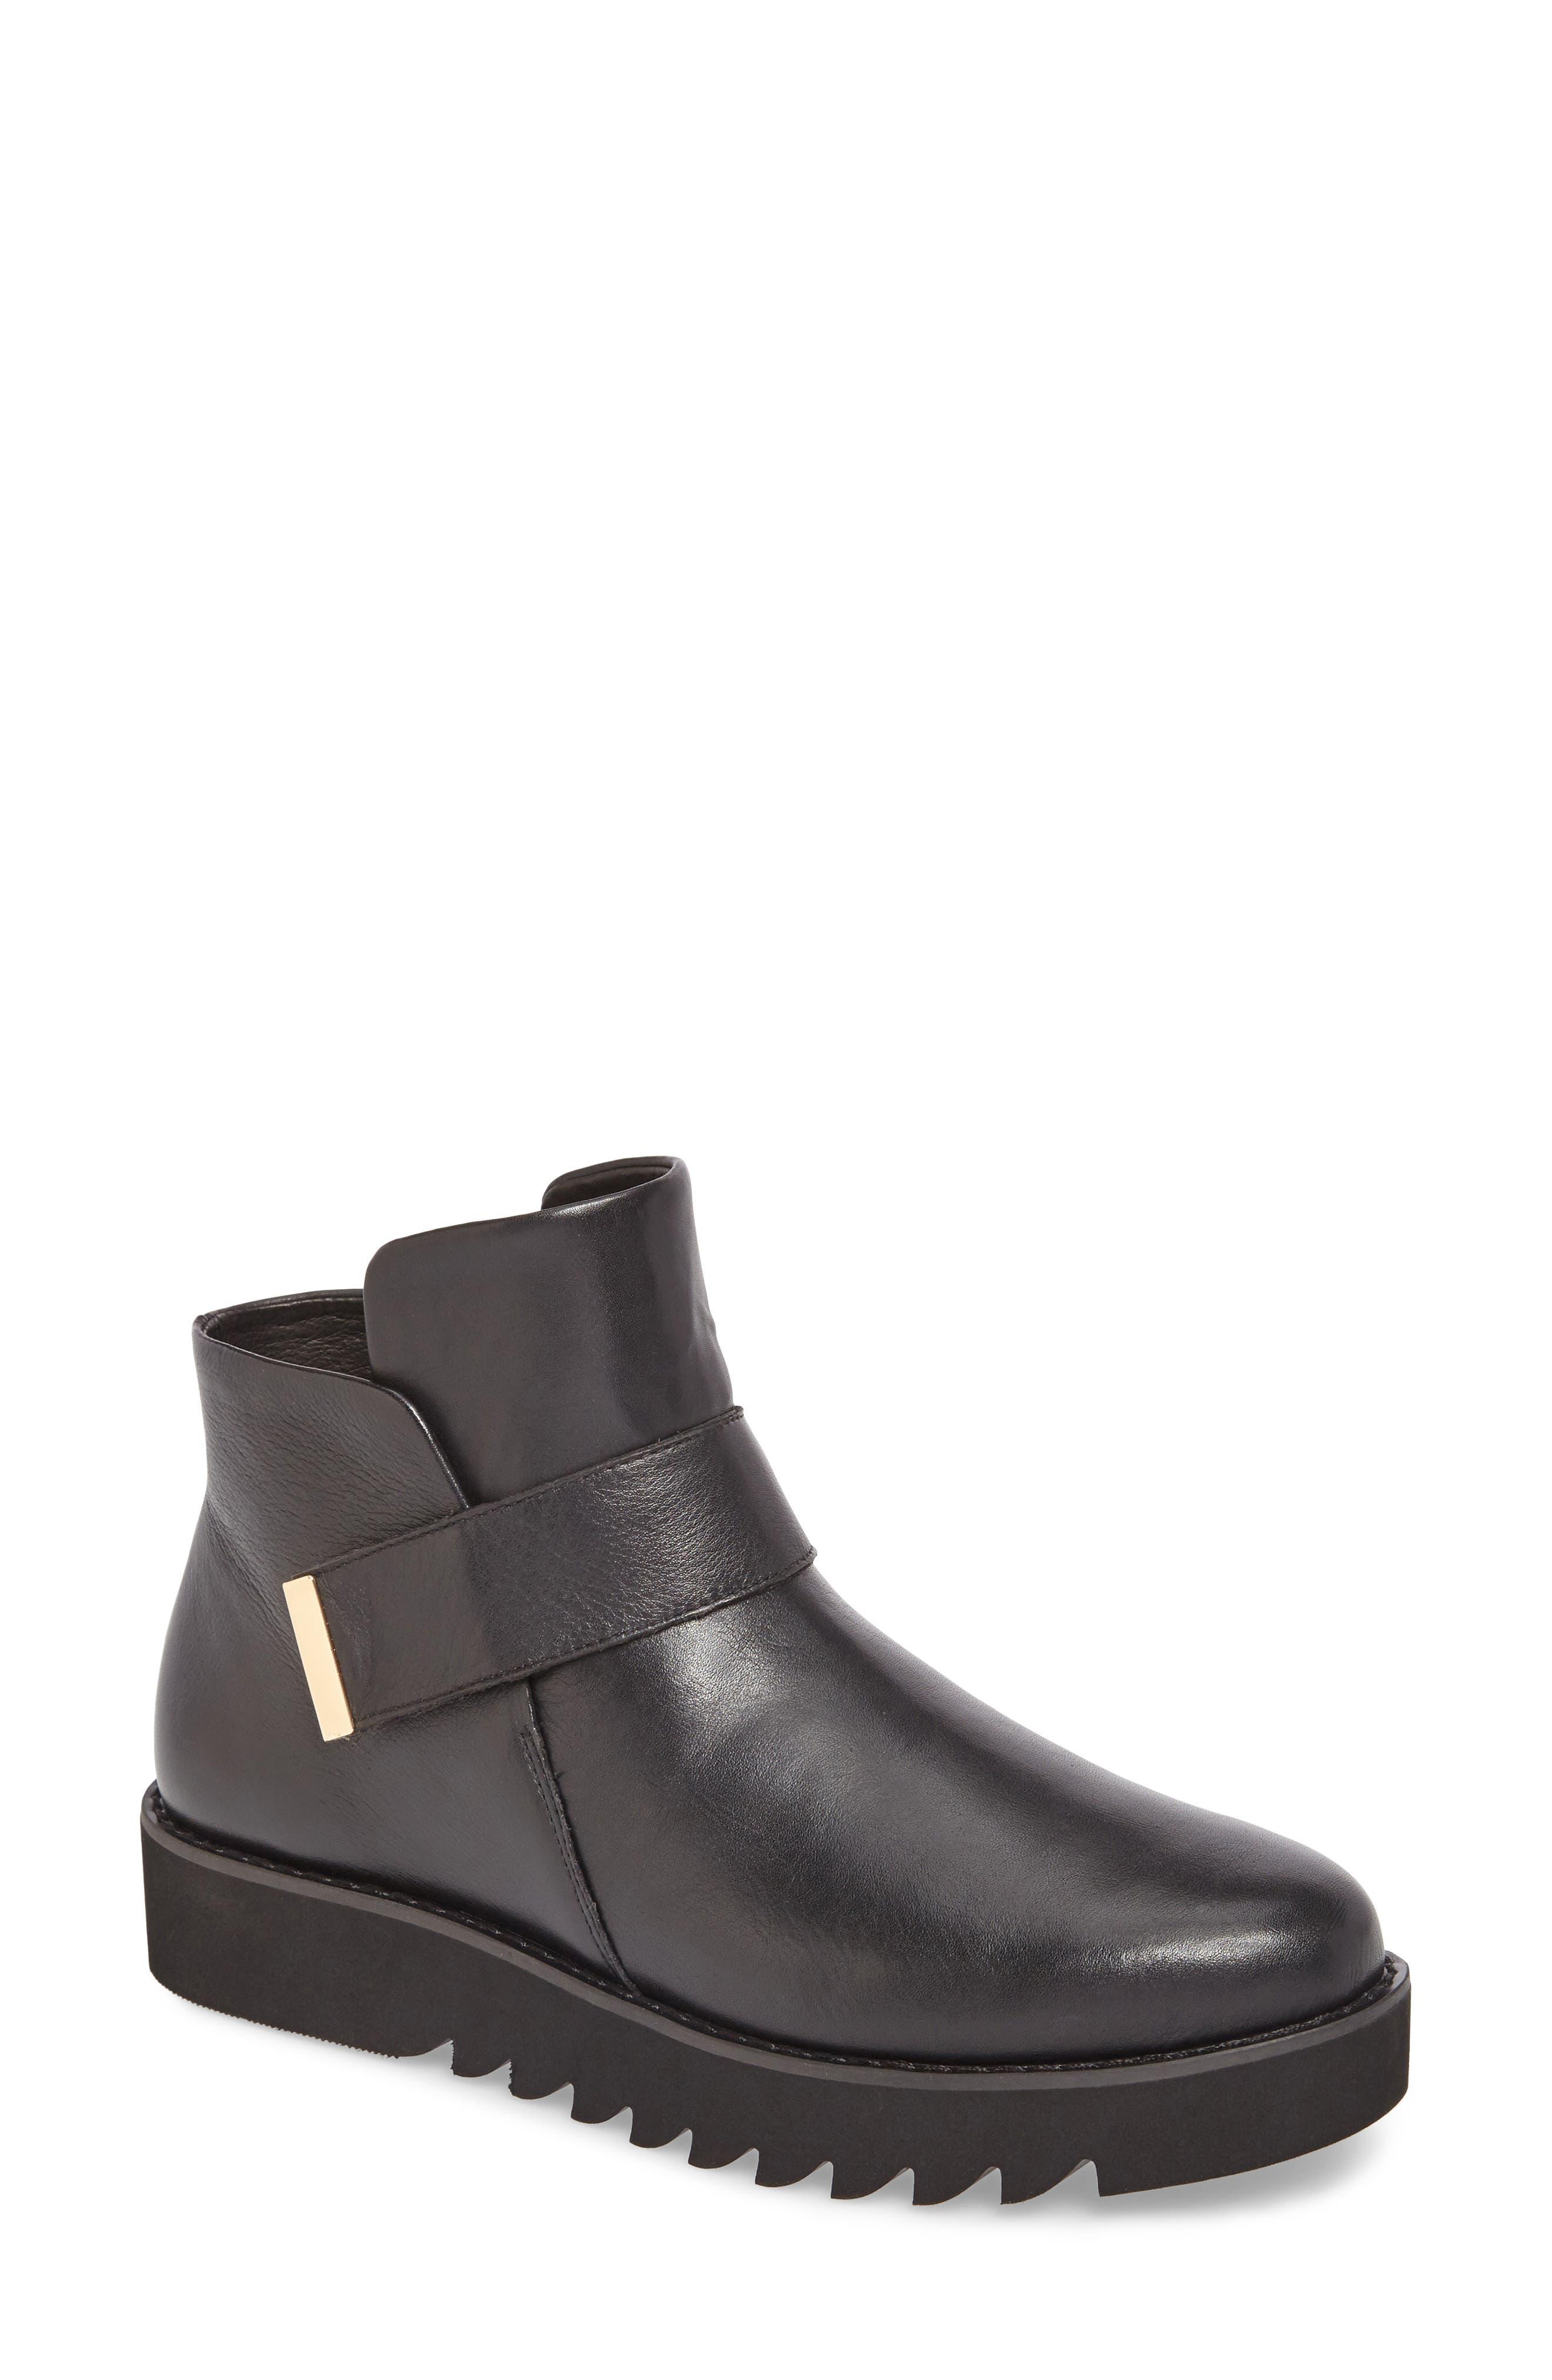 Kris Boot,                         Main,                         color, Black Leather